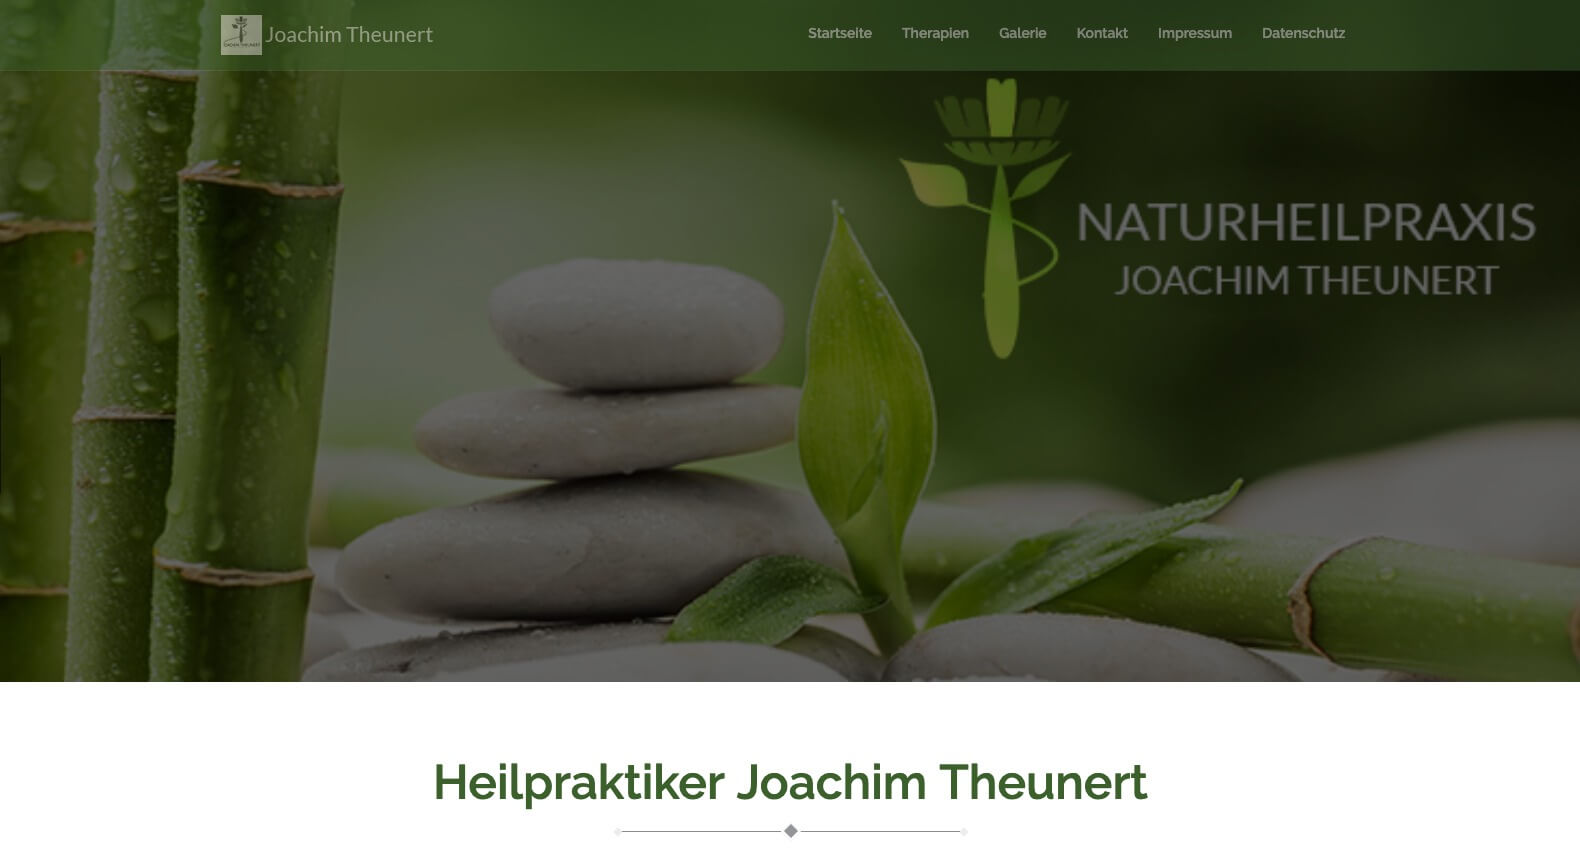 Image of Ganzheitliche Naturheilpraxis in Nürnberg: Heilpraktiker Joachim Theunert